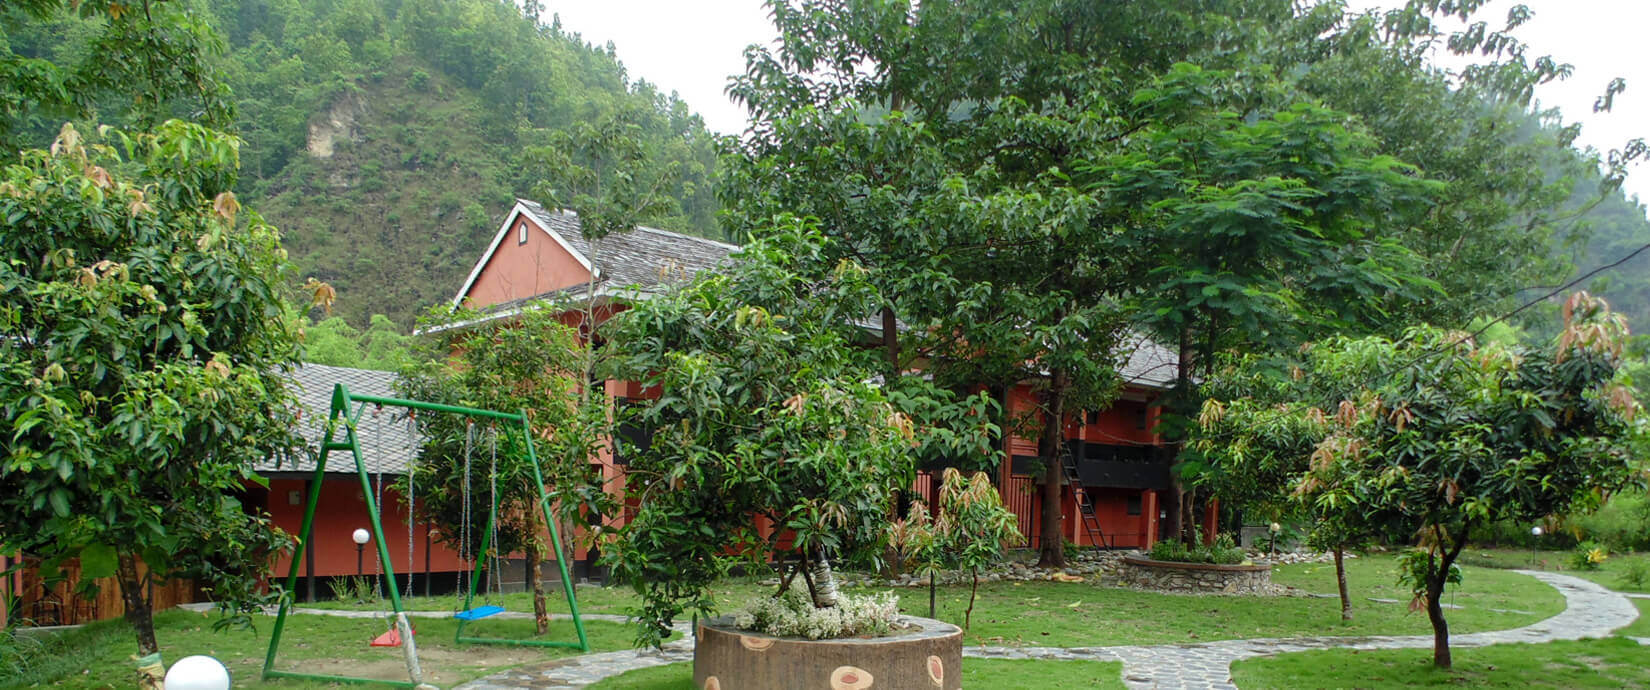 Trishuli Rafting Hotel and Package - River Fun Beach Resort